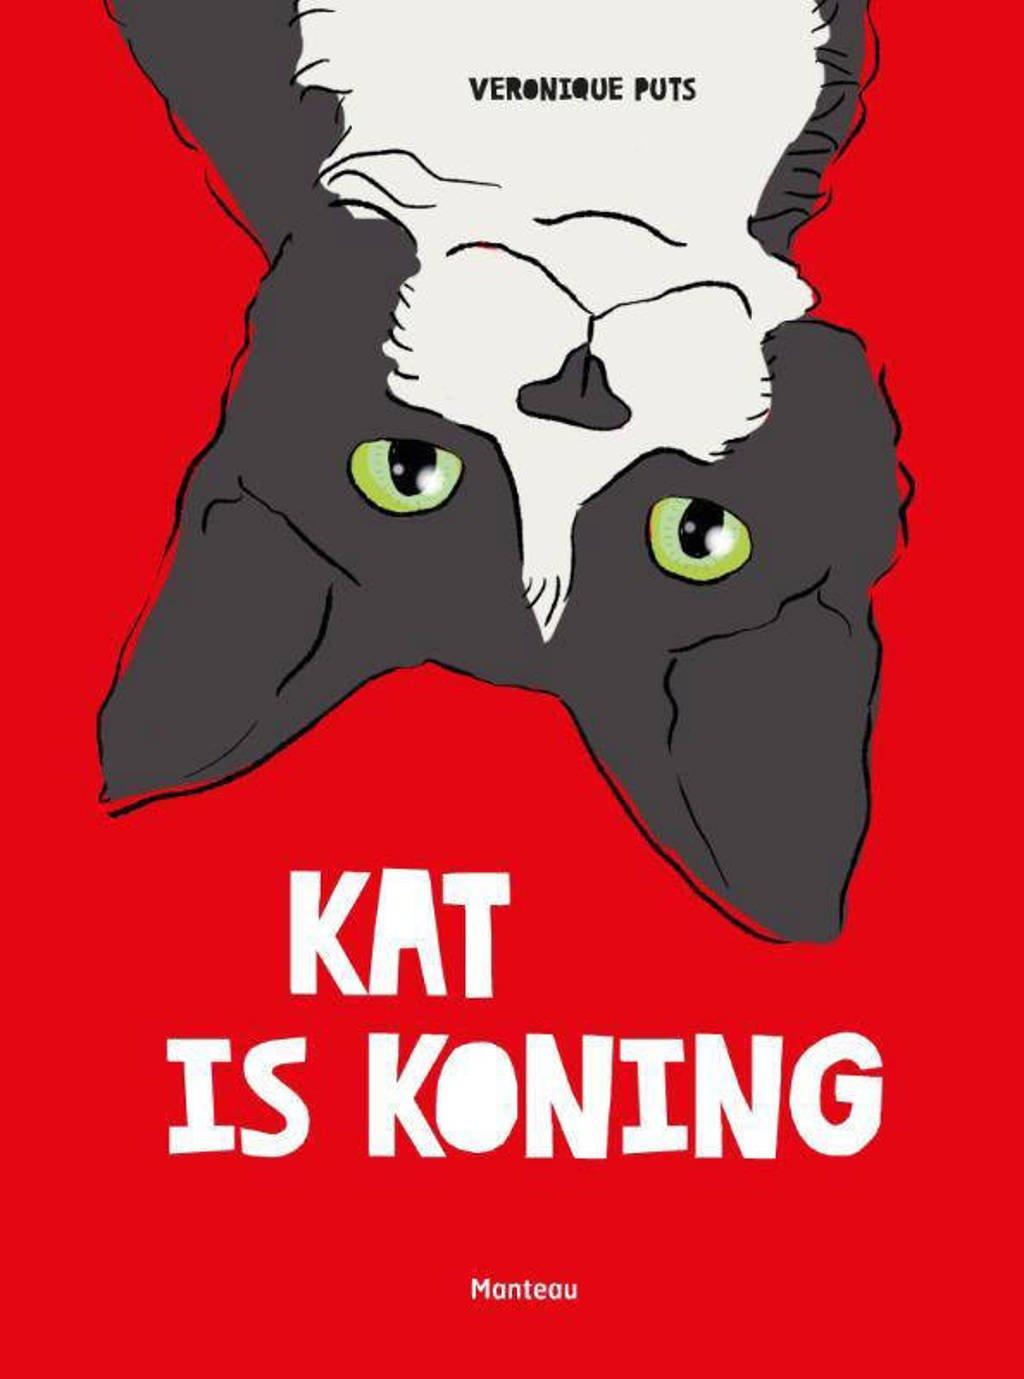 Kat is koning - Veronique Puts